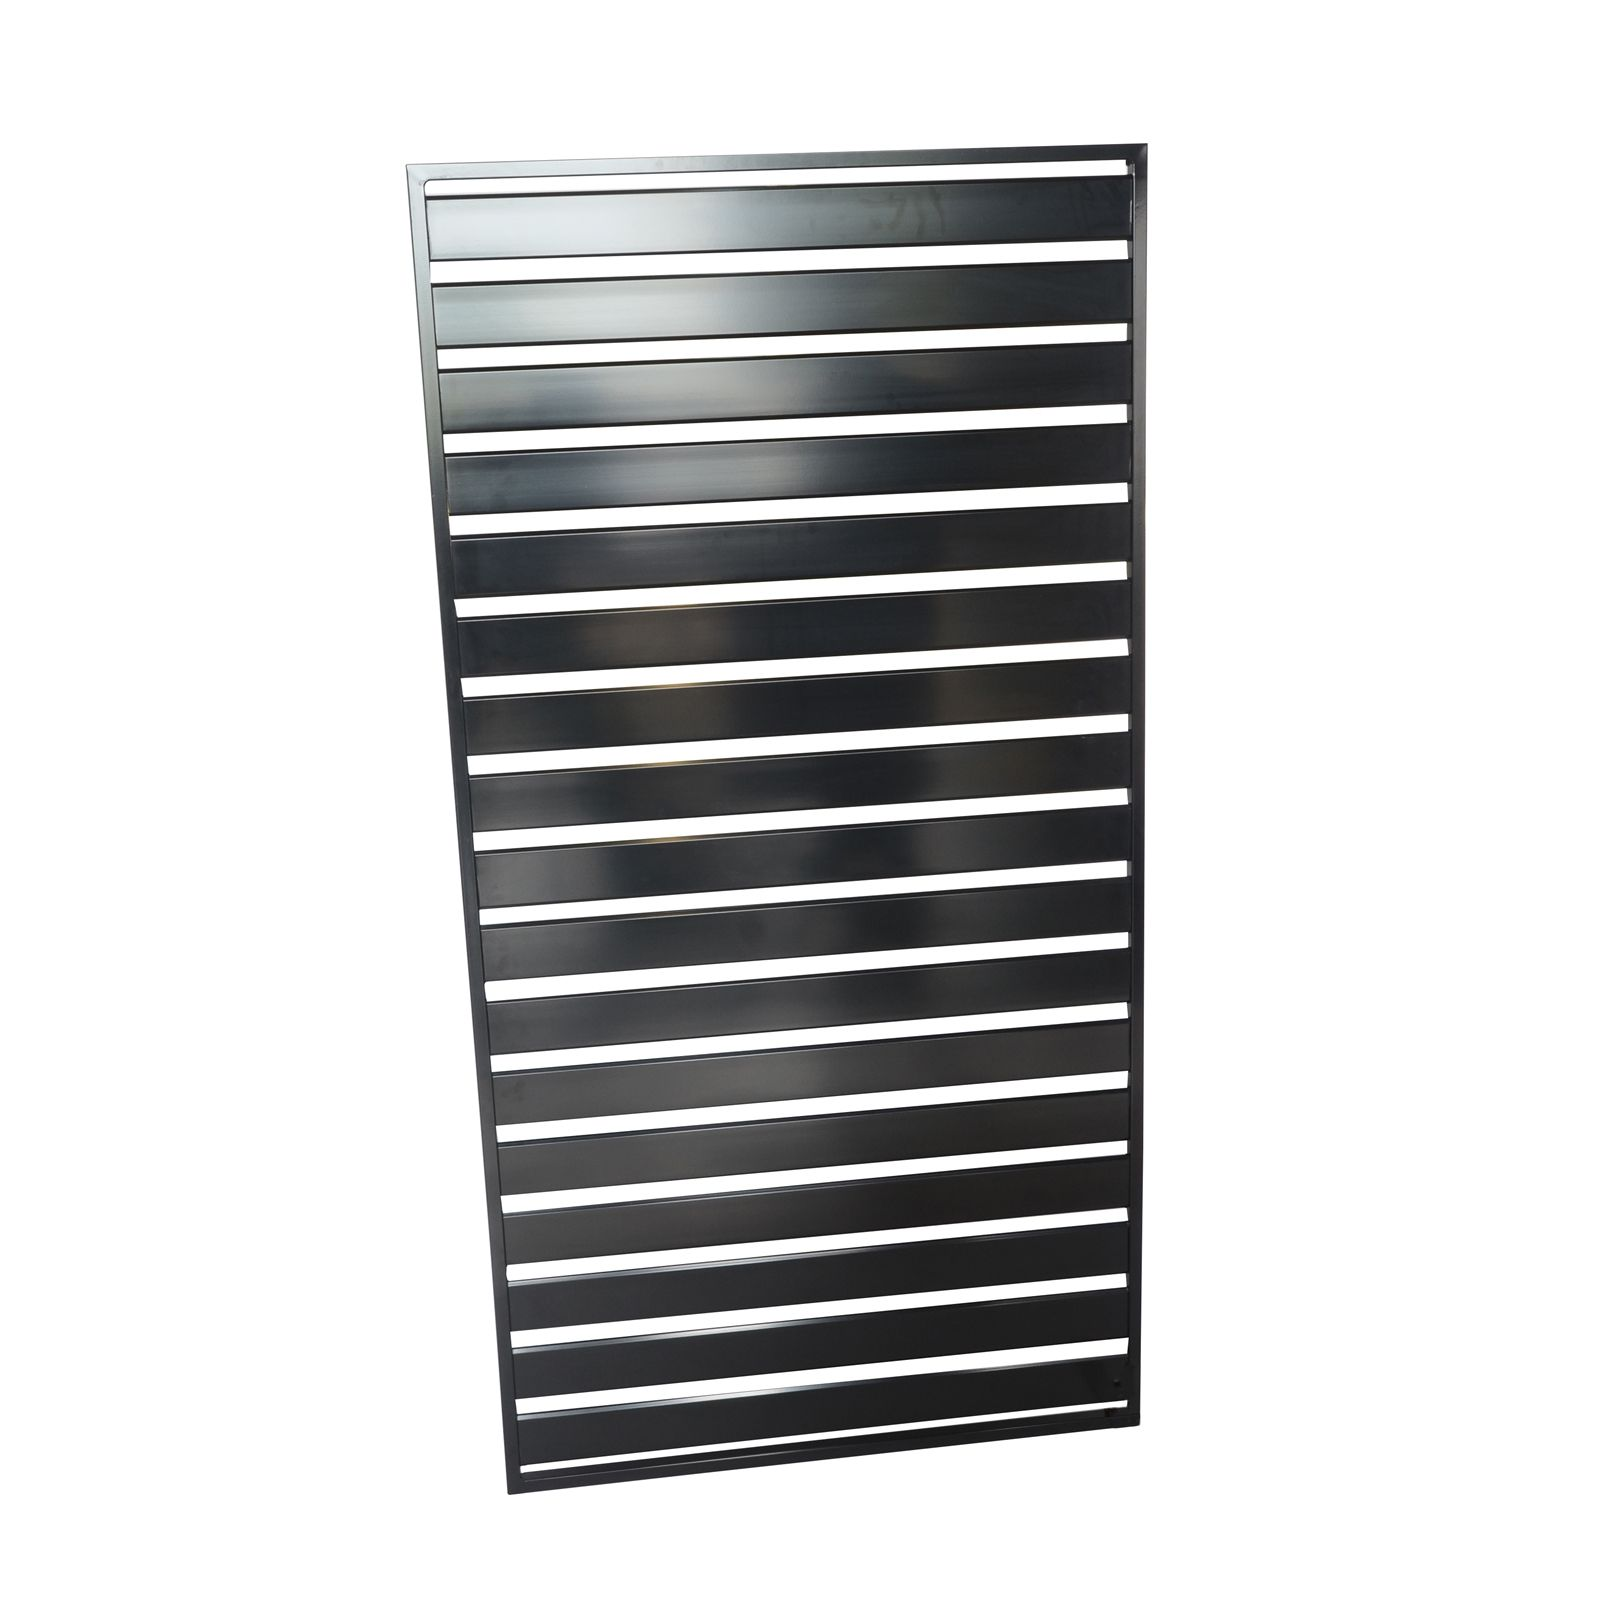 Protector Aluminium 900 X 1750mm Easy Screen Welded Slat Panel Black Bunnings 131 Weld Slats Diy Installation